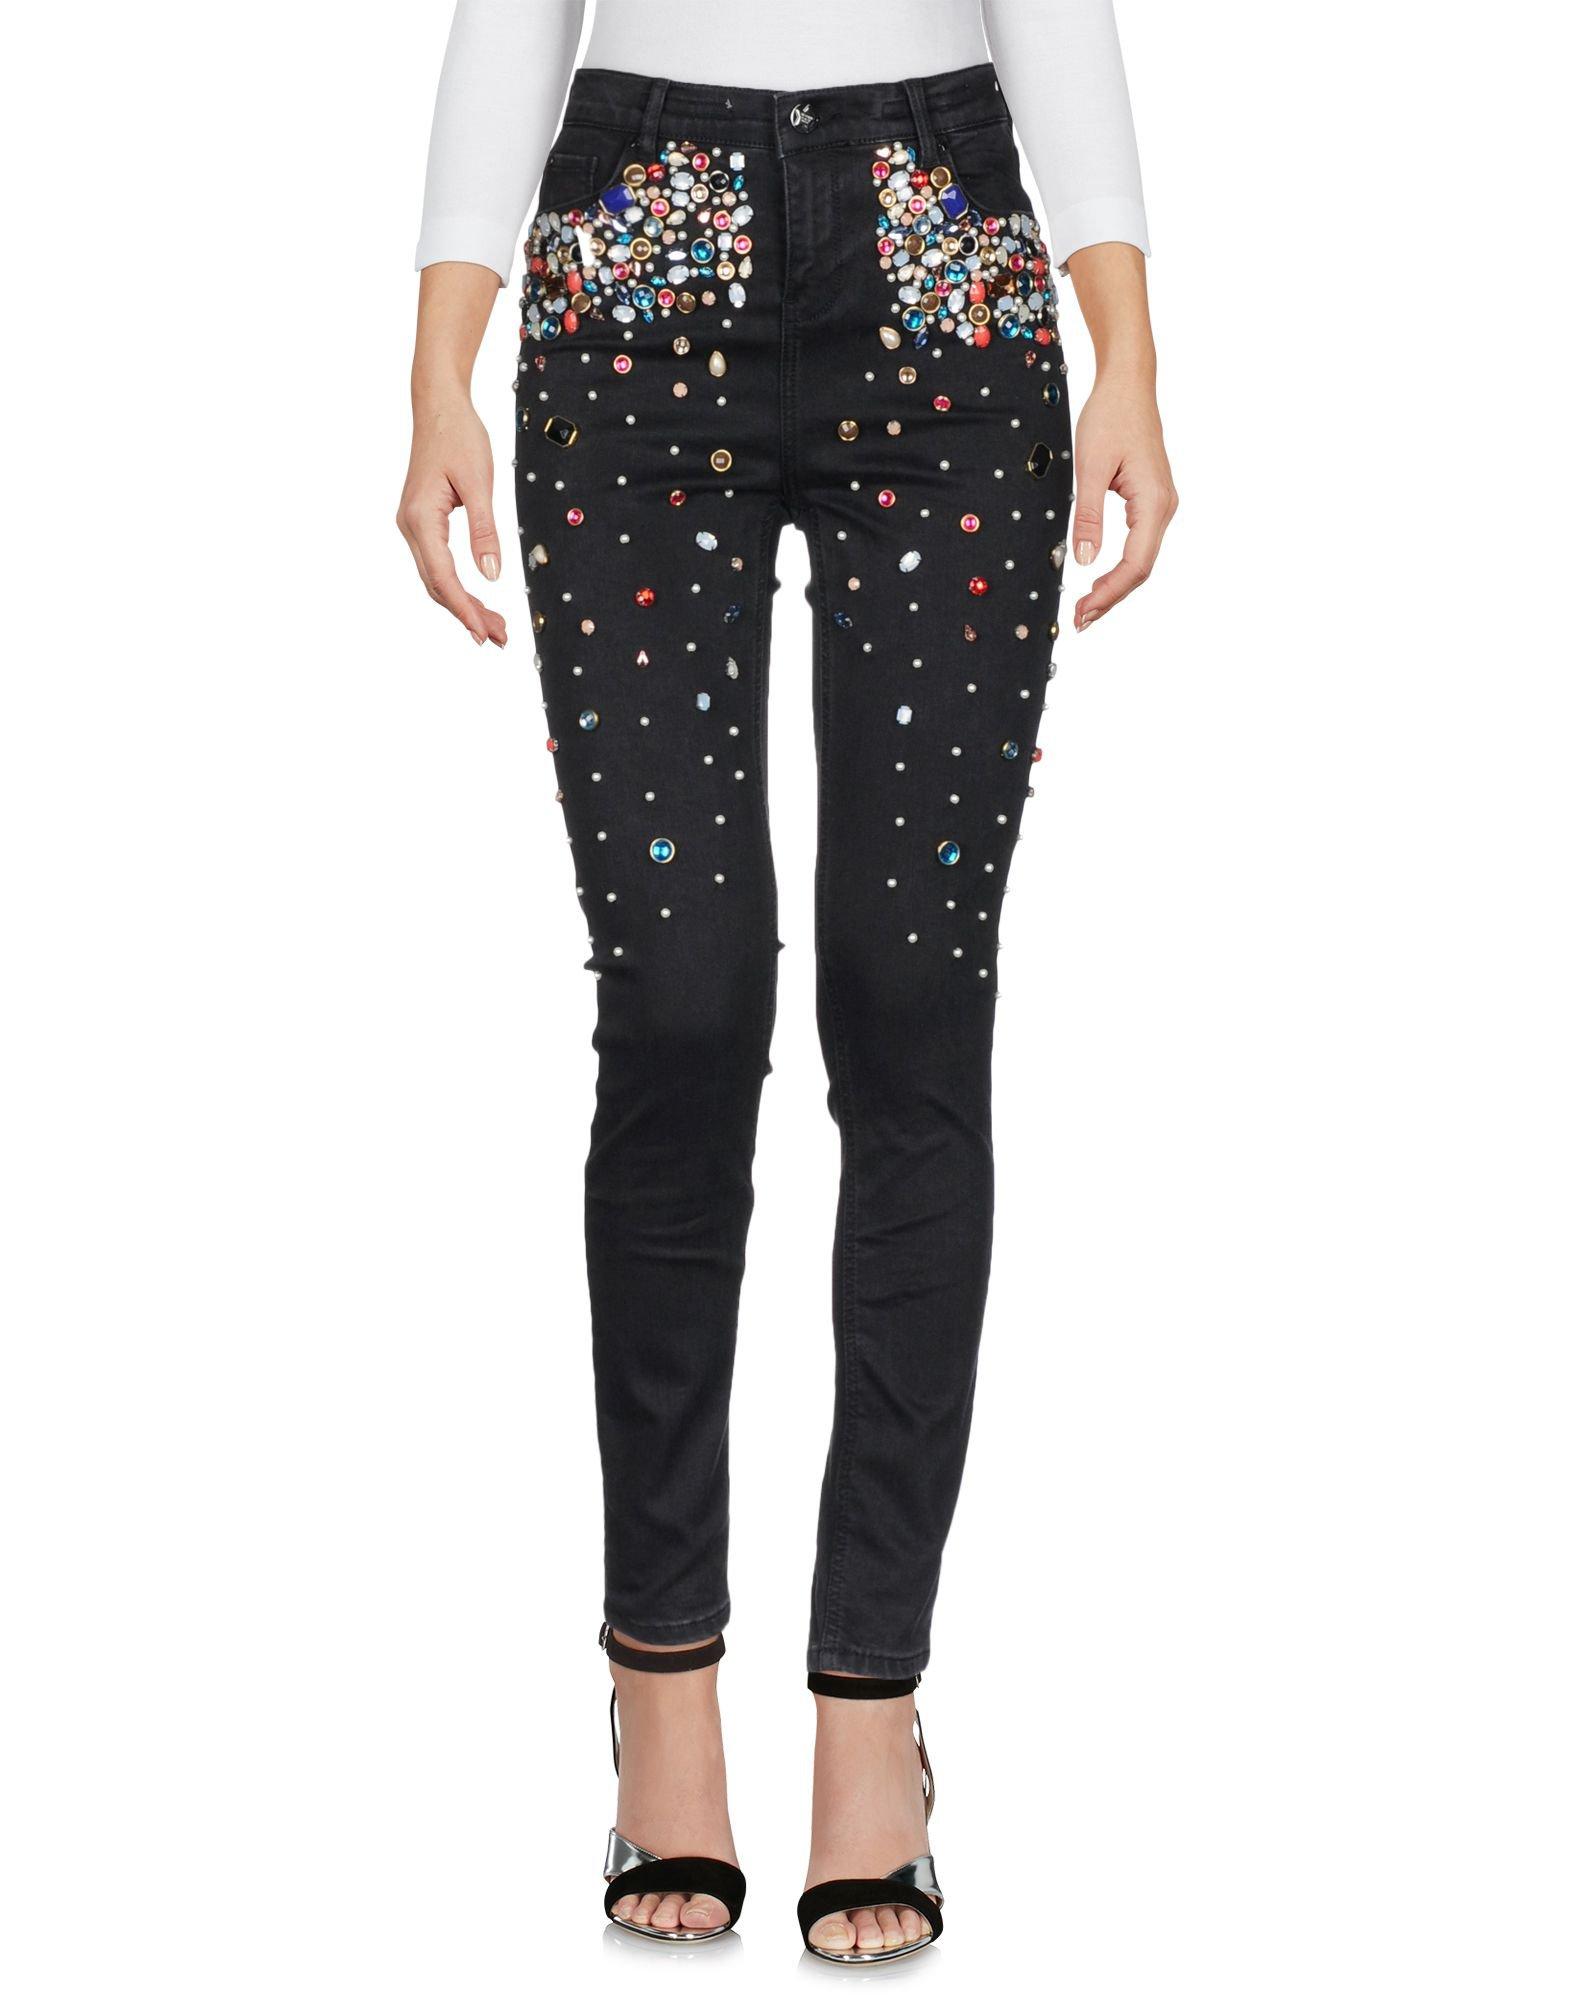 Silvian Heach Denim Pants - Women Silvian Heach Denim Pants online on YOOX United States - 42670839BJ